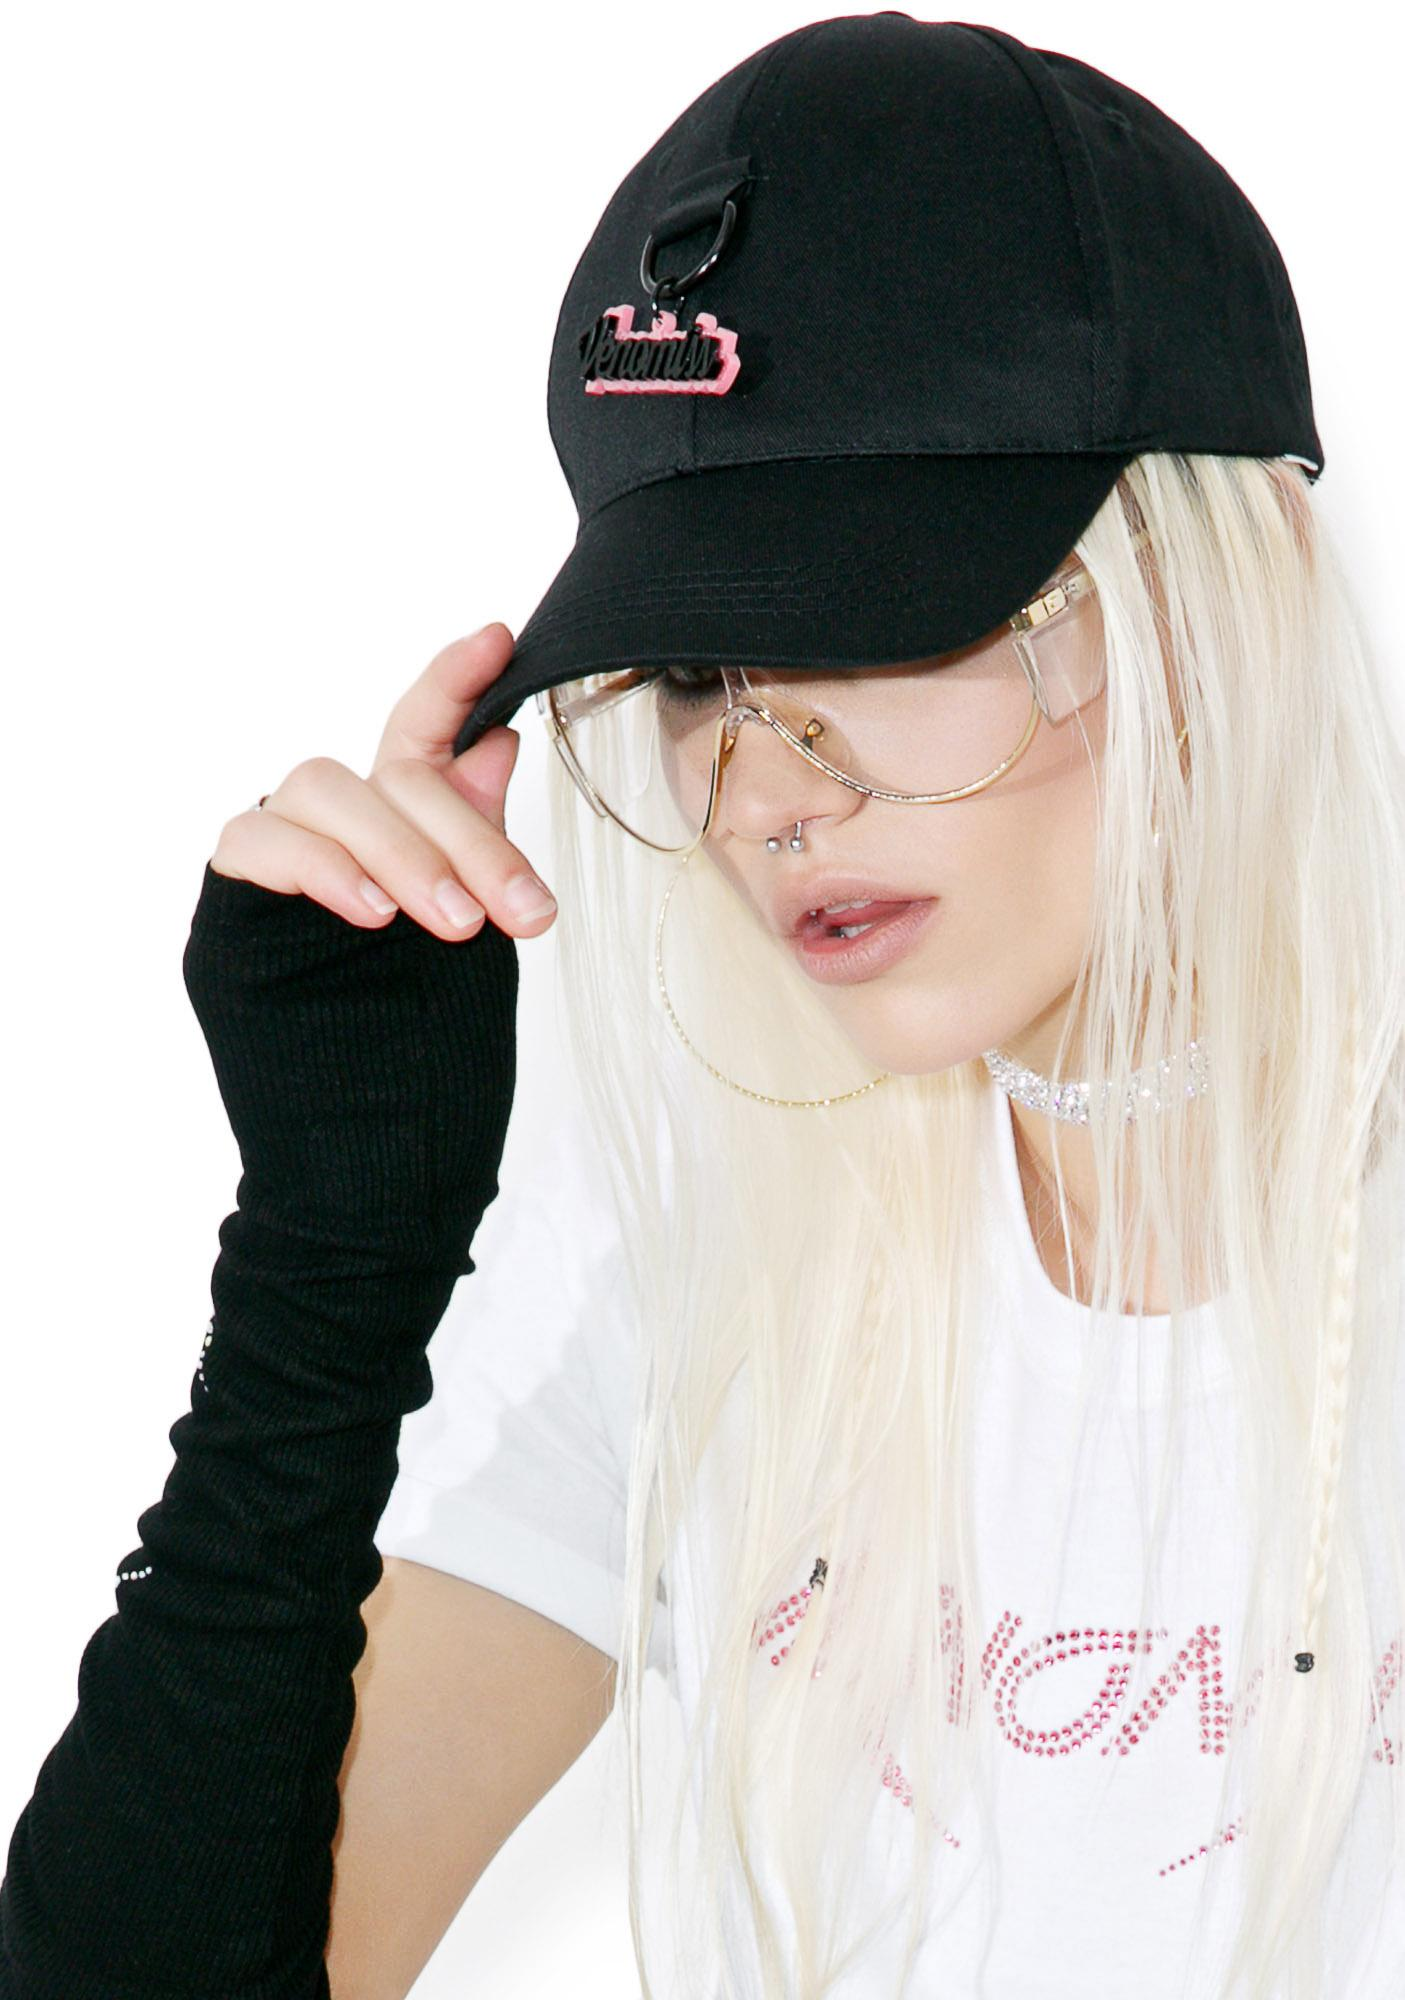 6506b086e81 ... Venomiss NYC Glitter Charm Baseball Hat ...